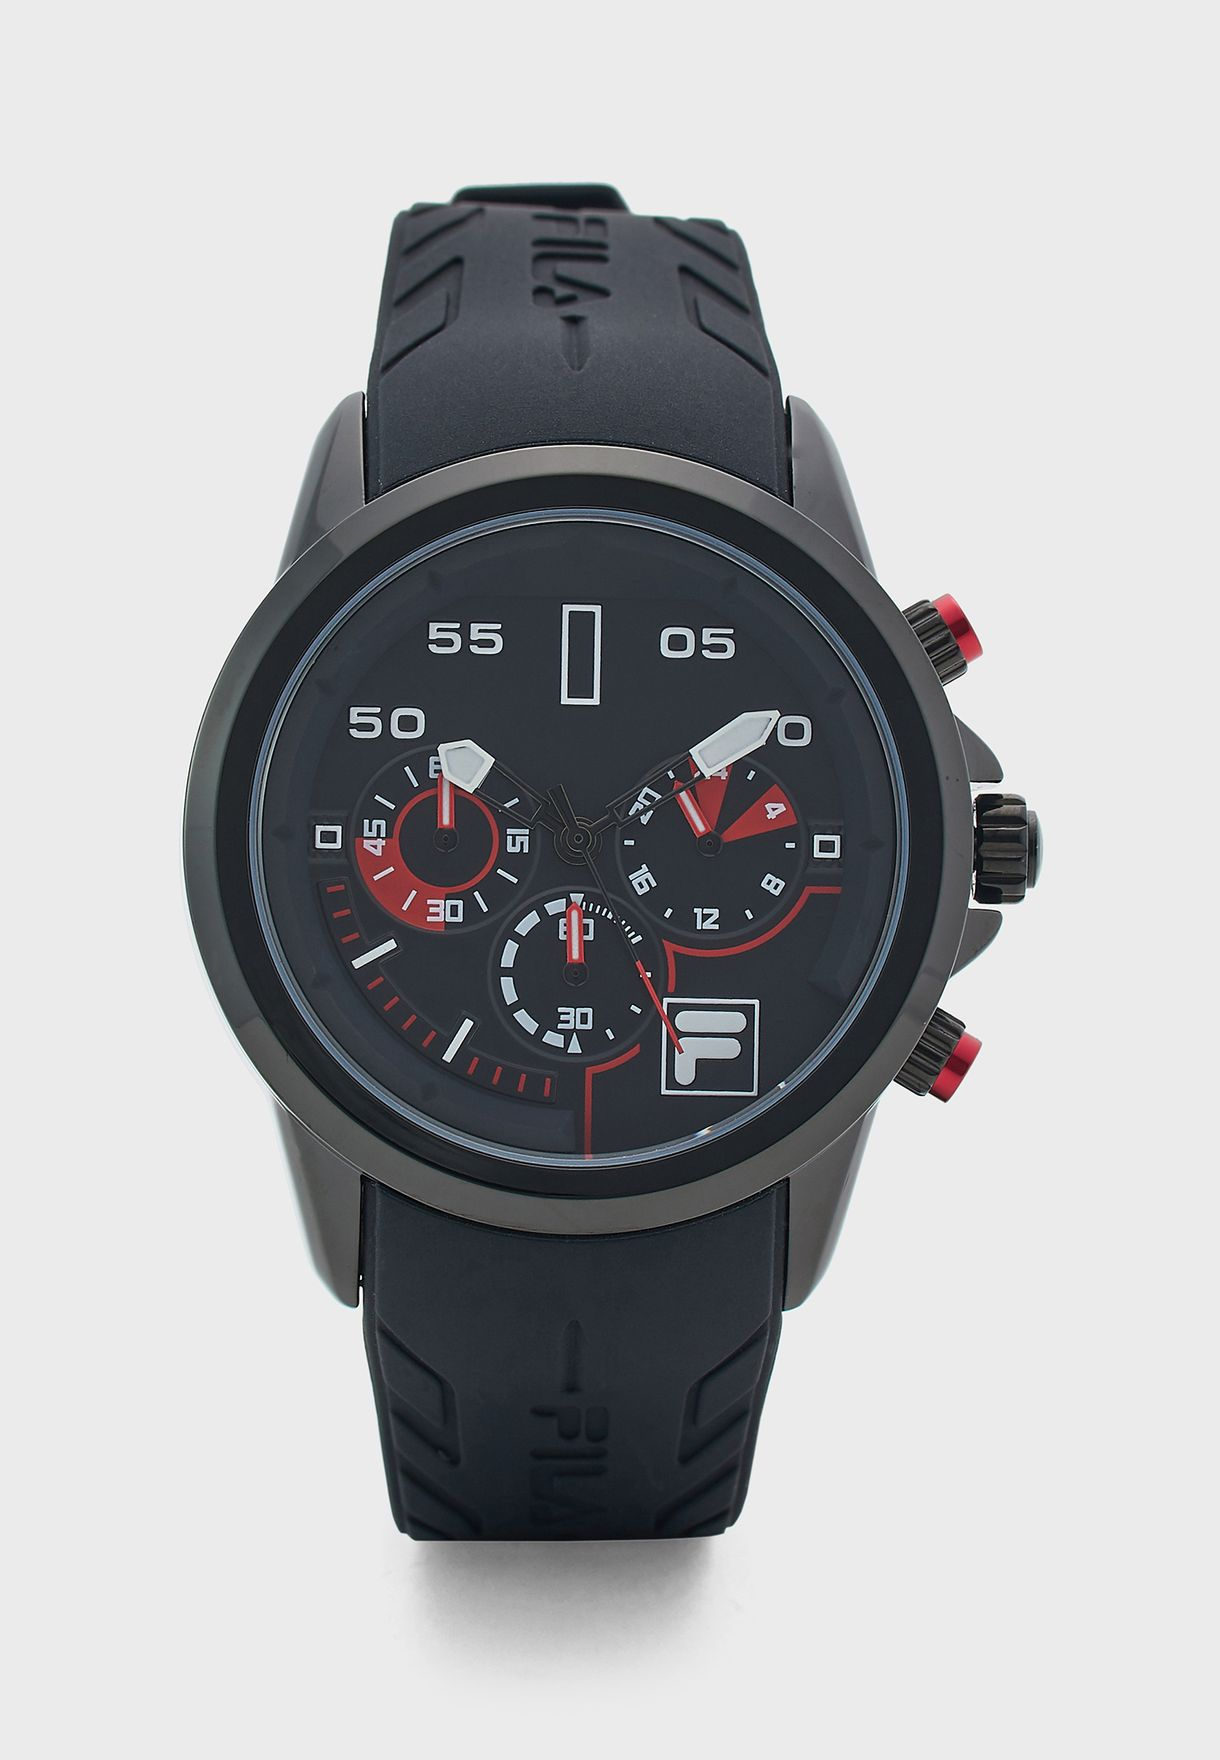 Time Module Vd54 Watch